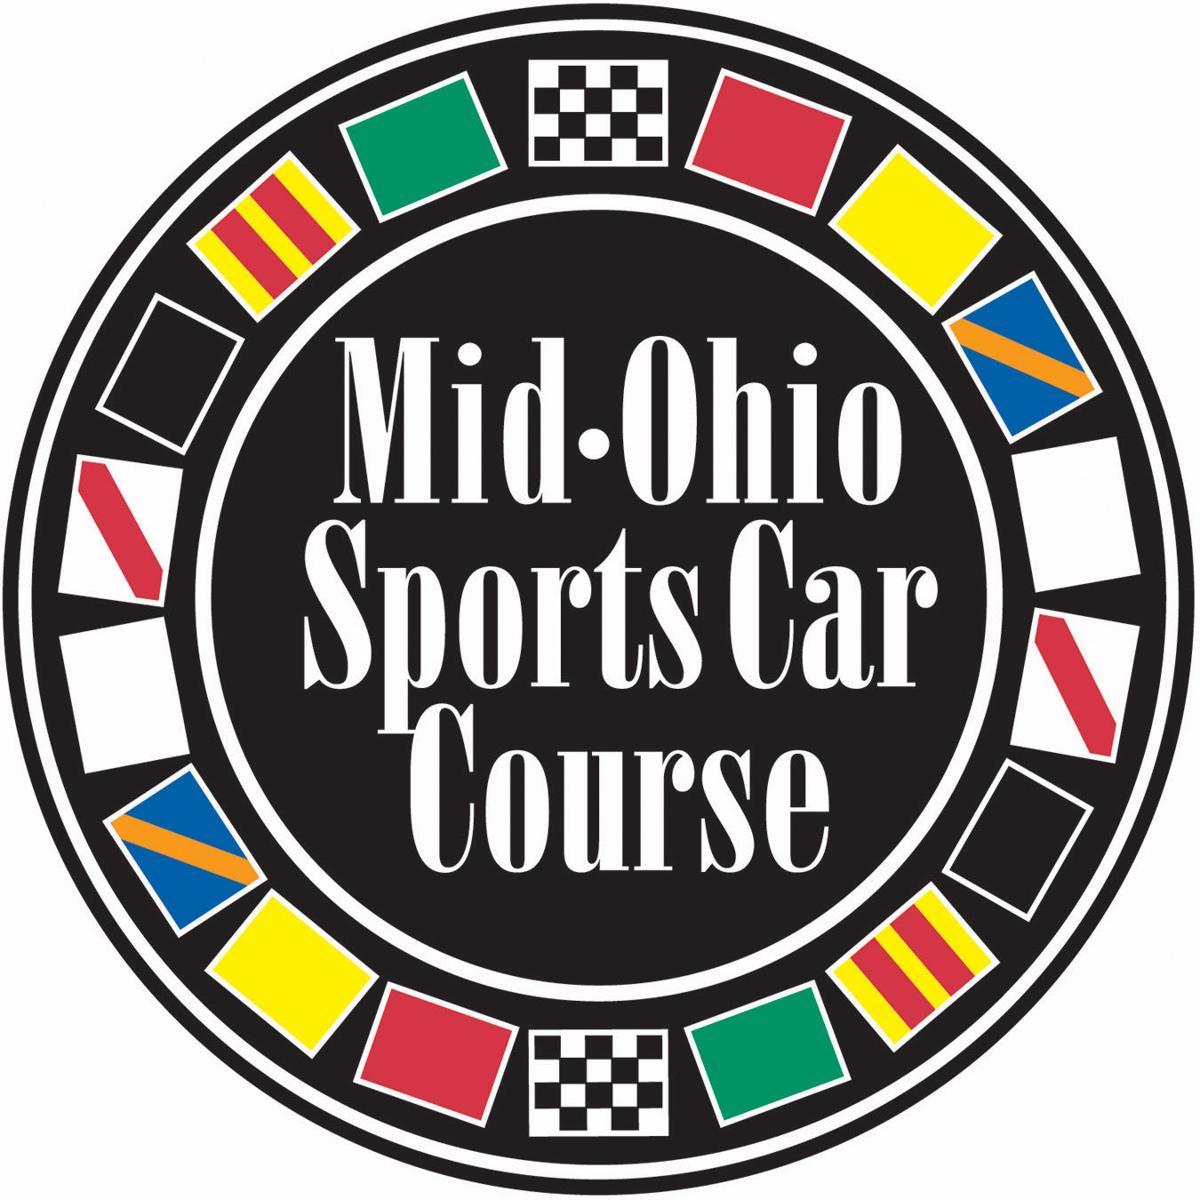 Mid Ohio Sports Car